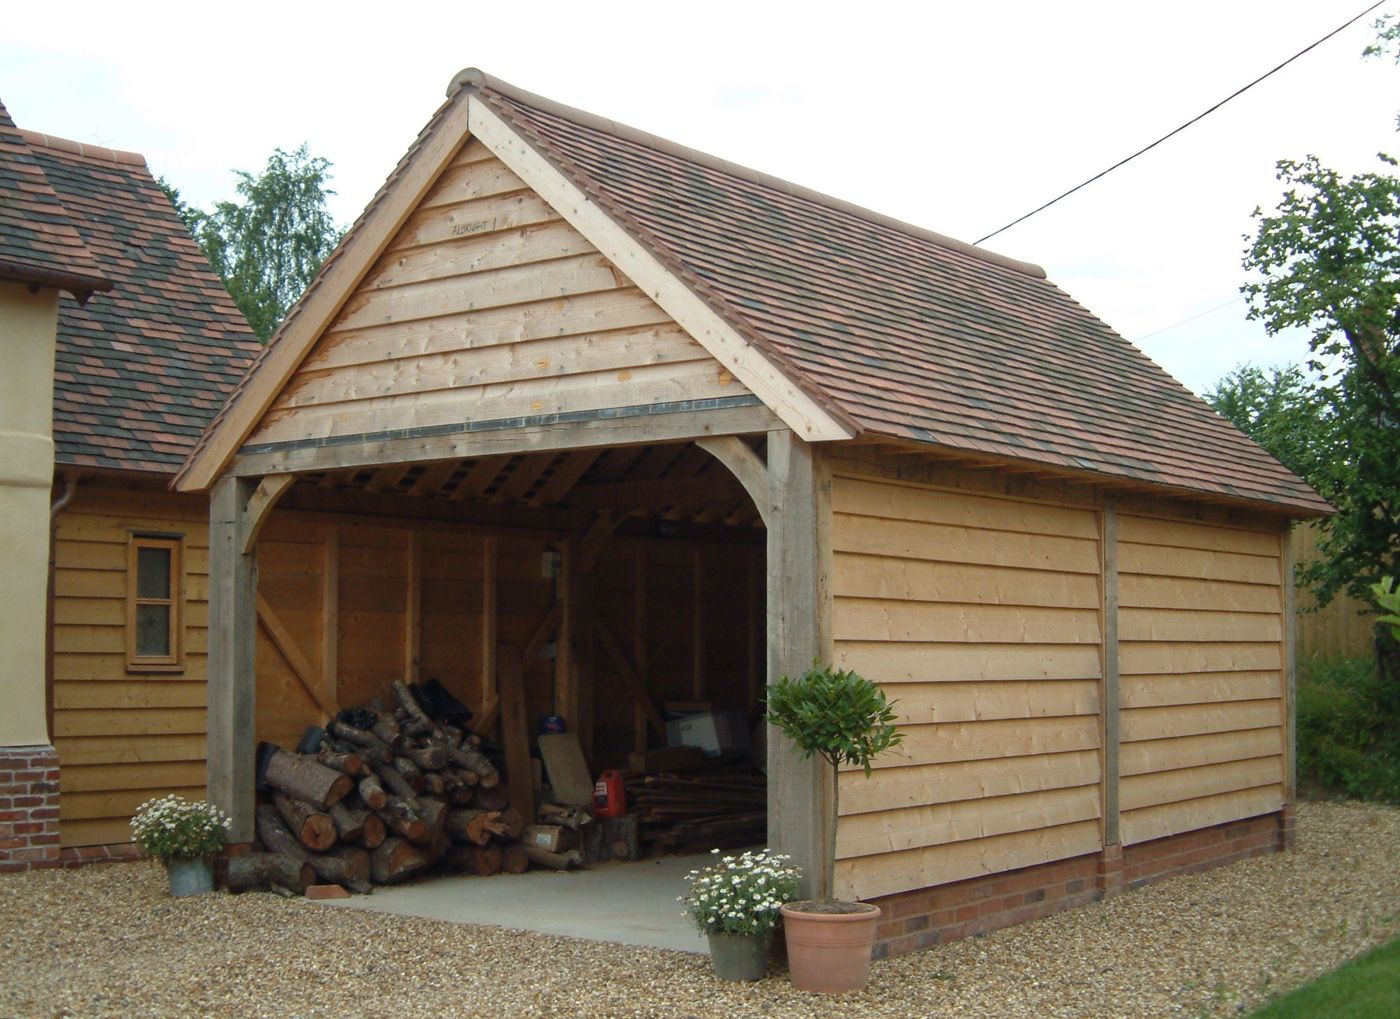 Garages and Carports Timber frame garage, Carport